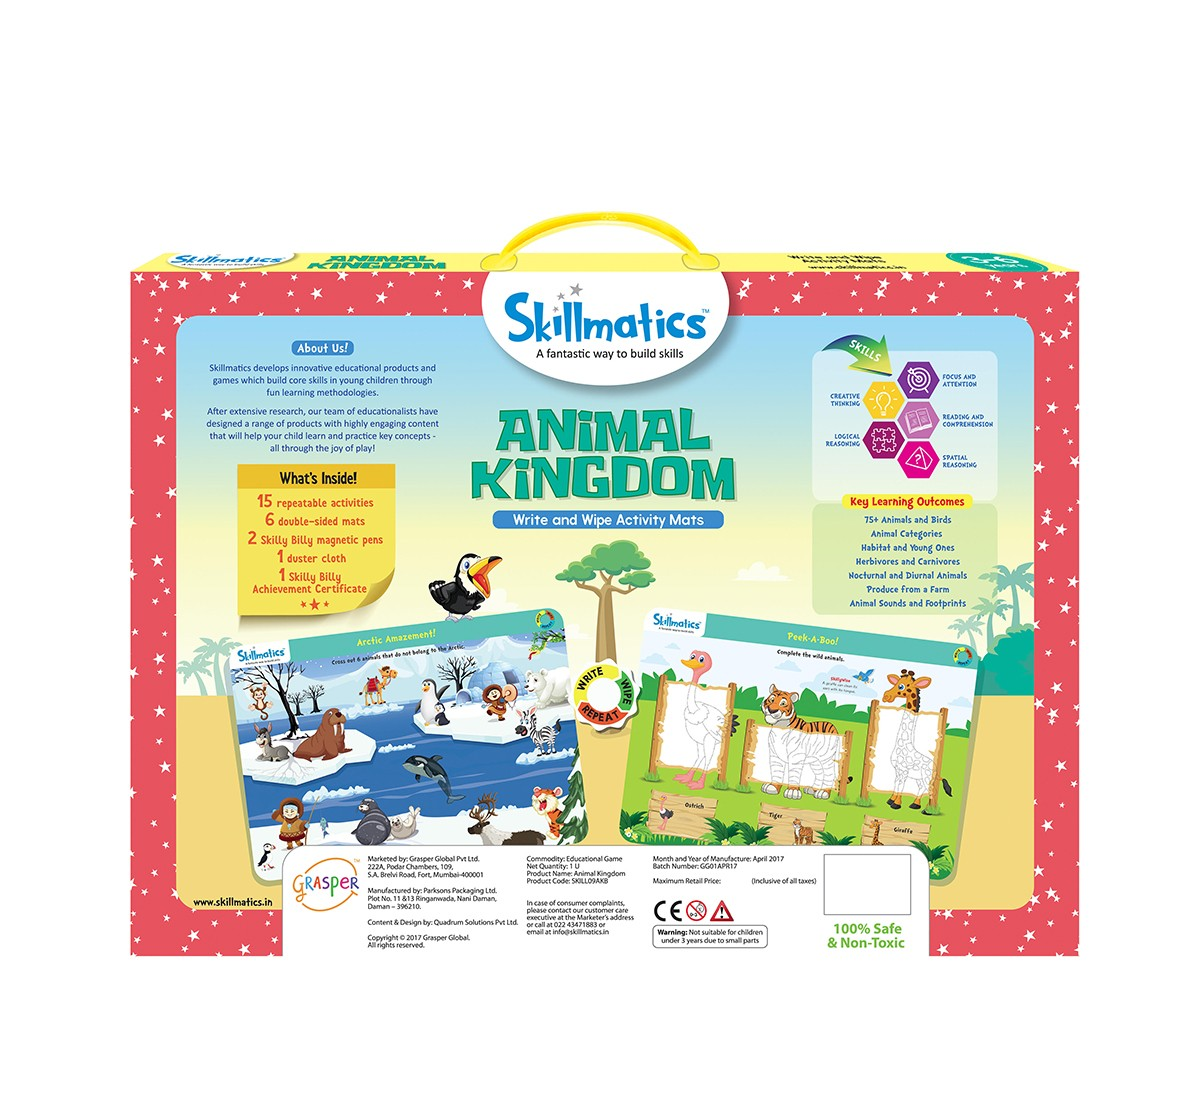 Skillmatics Animal Kingdom Games for Kids age 3Y+